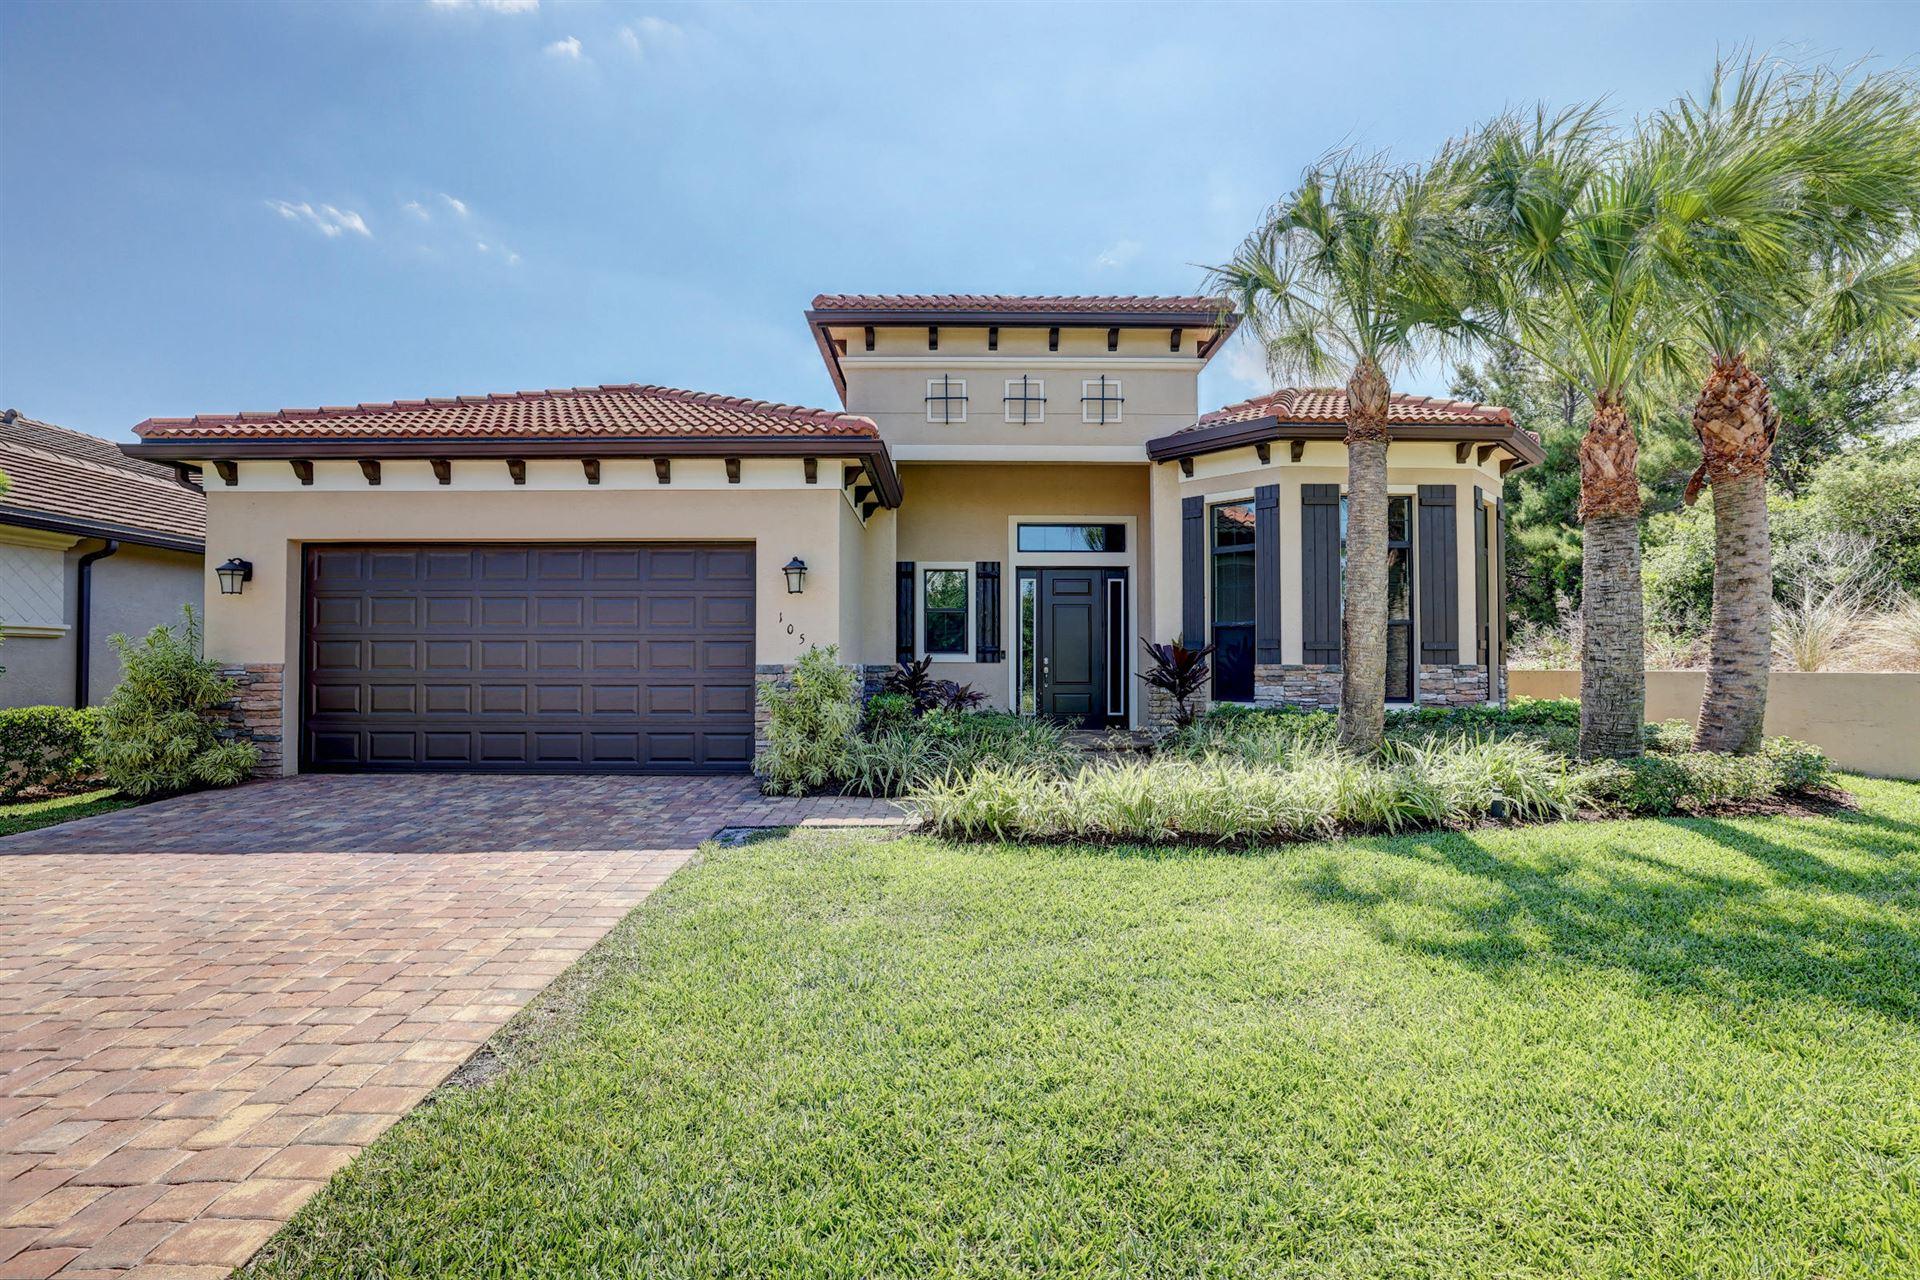 1056 NE Savannah Oaks Way, Jensen Beach, FL 34957 - #: RX-10707362